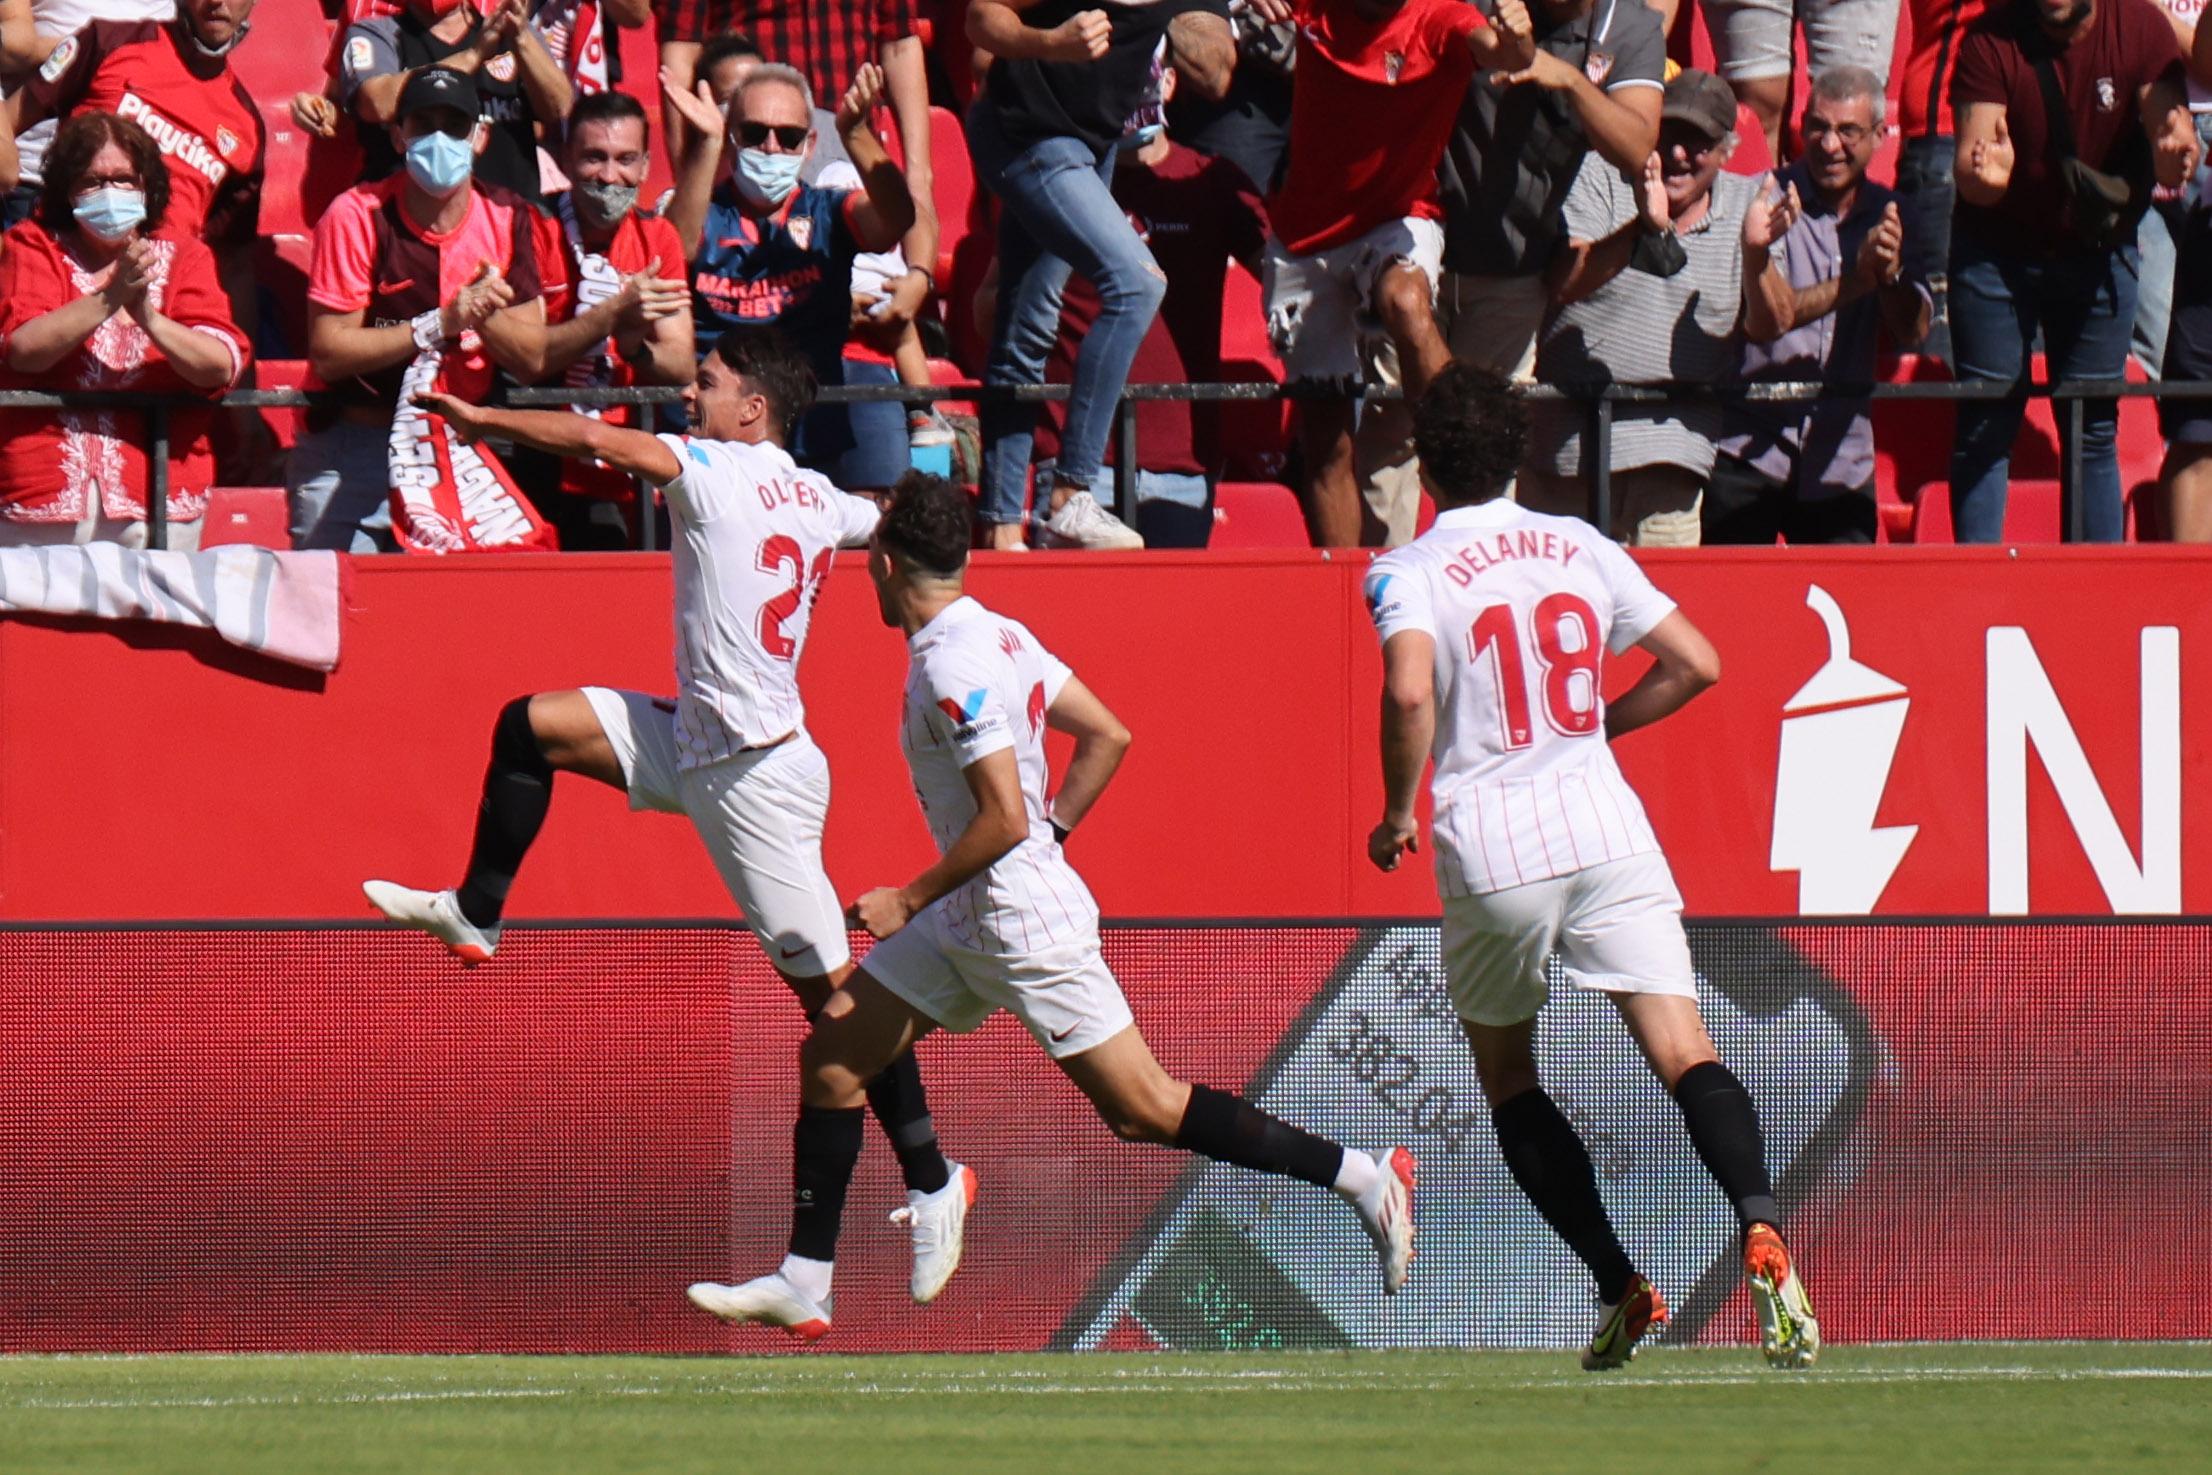 Sevilla go top after winning 5-3 shootout with Levante at the Sanchez-Pizjuan